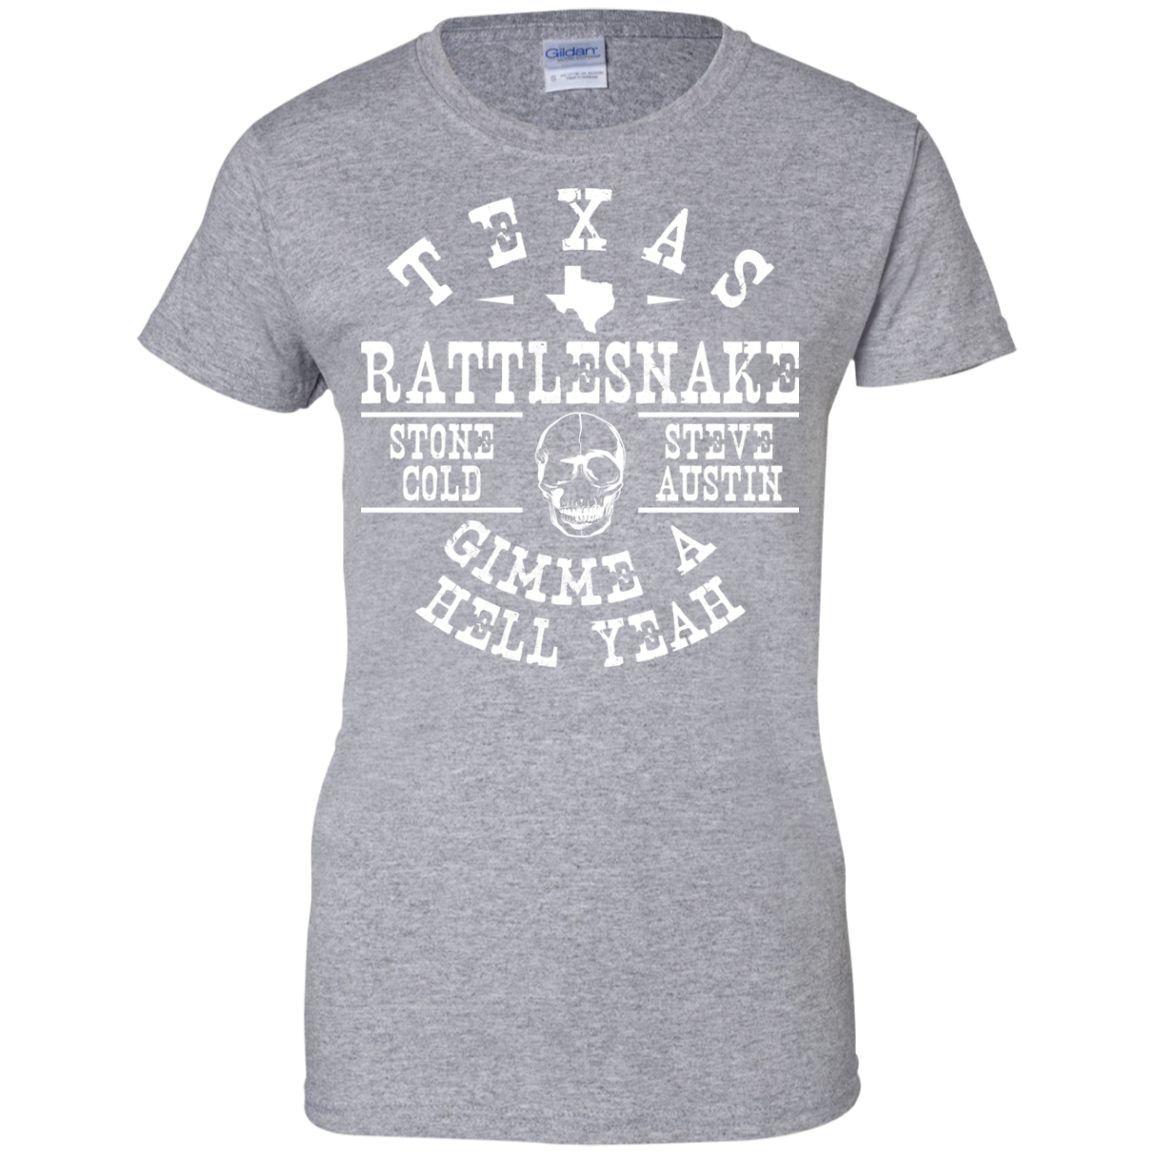 Stone Cold Steve Austin Texas Rattlesnake Vintage T-Shirt-01 Ladies Custom 100% Cotton T-Shirt